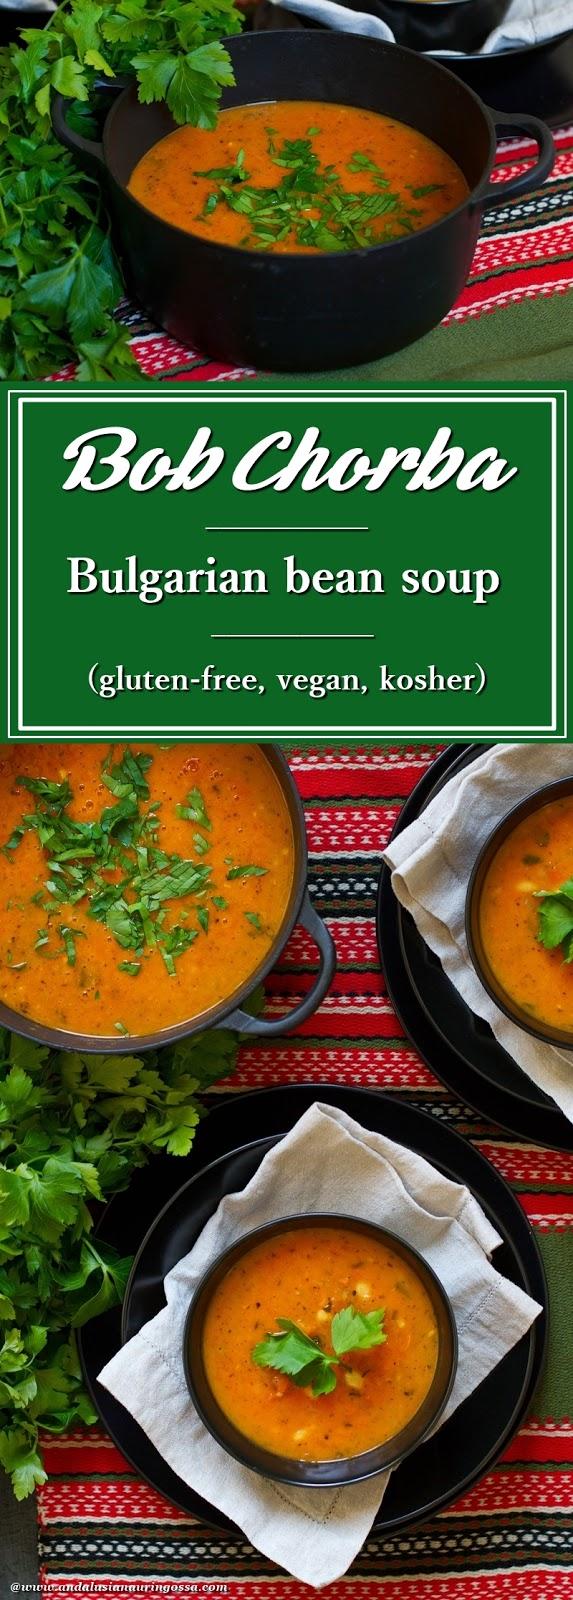 Bob Chorba -_Bulgarian bean soup_monastery soup_gluten-free_vegan_kosher_PIN ME